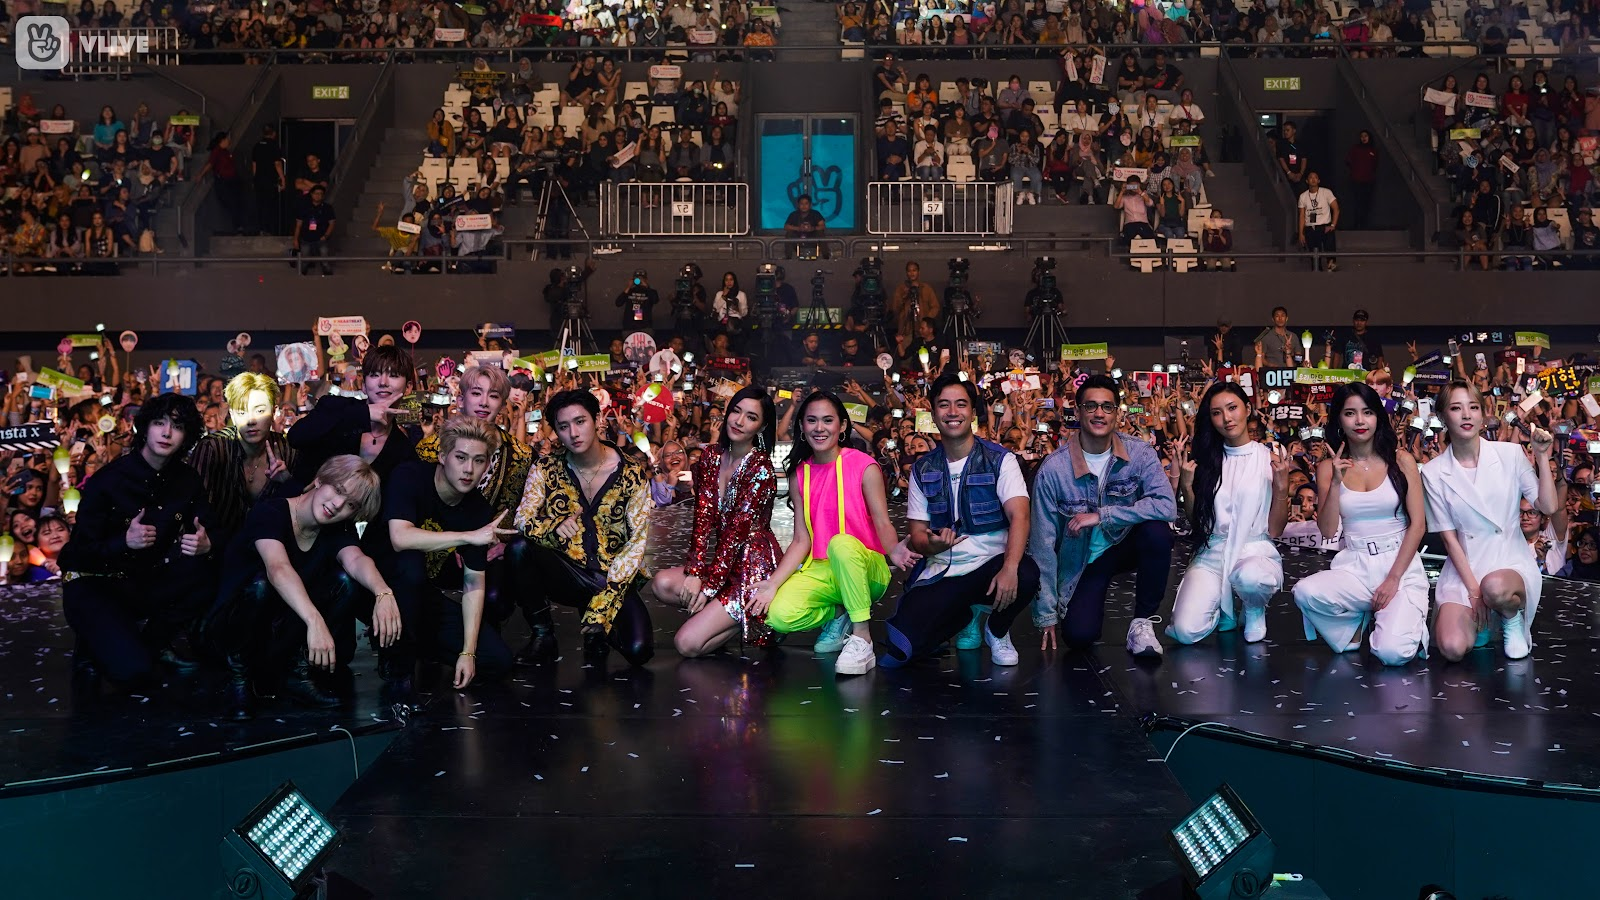 konser-v-heartbeat-pertama-berlangsung-sukses-terima-kasih-v-live-indonesia